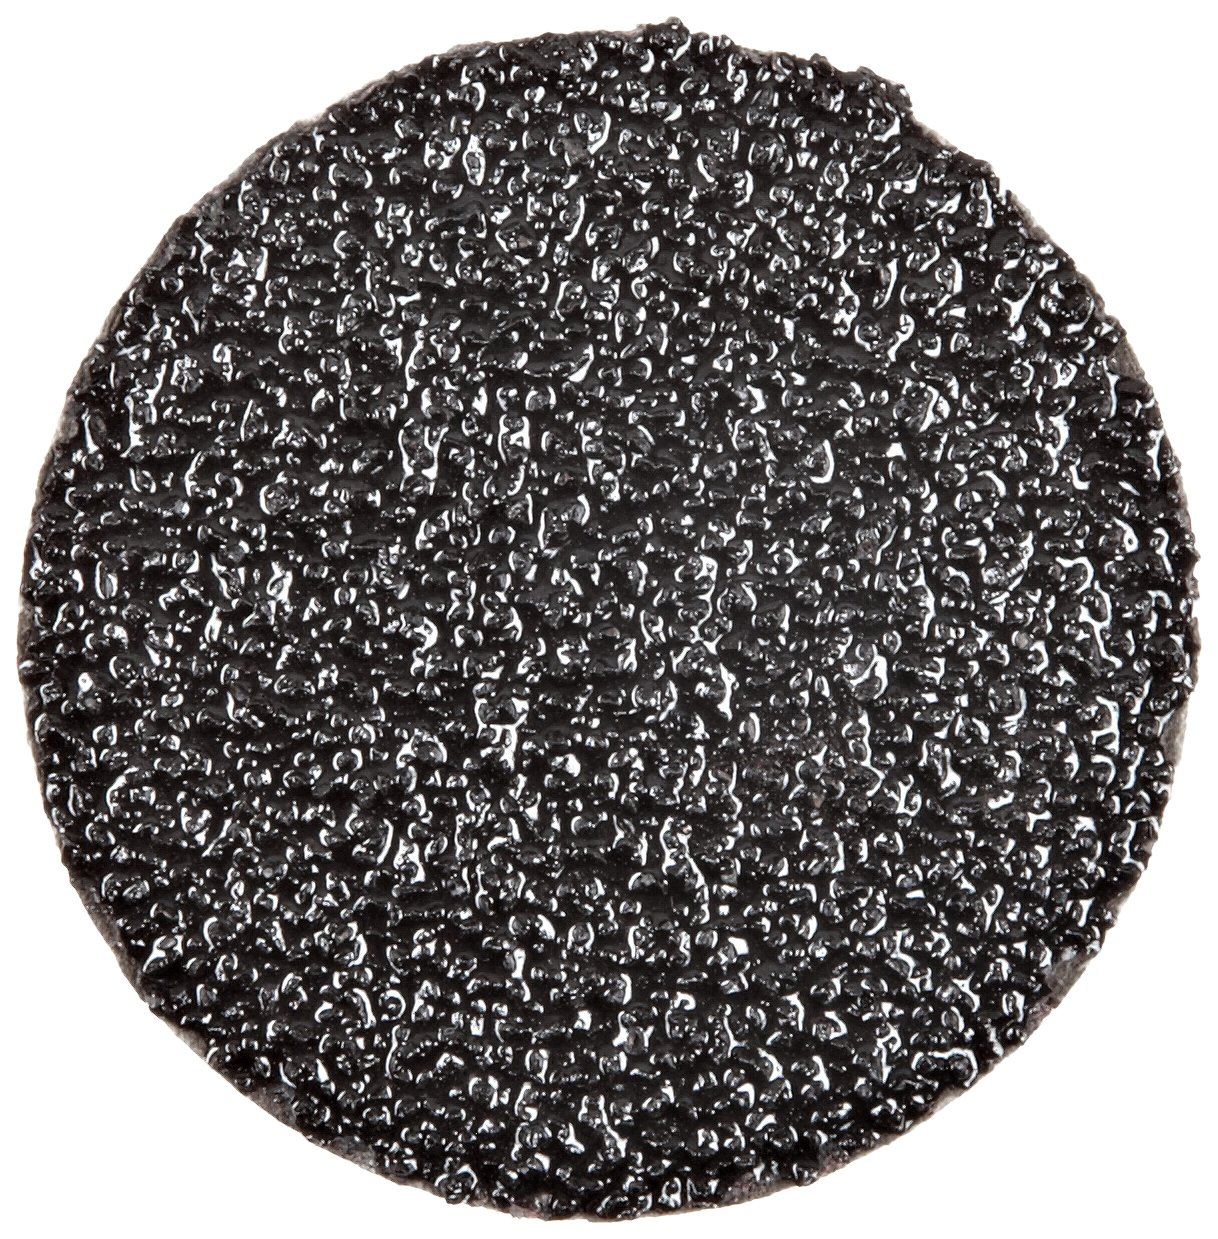 3M Roloc Fibre Disc 501C TR, Alumina Zirconia, 2'' Diameter, 36 Grit (Pack of 50) by Cubitron